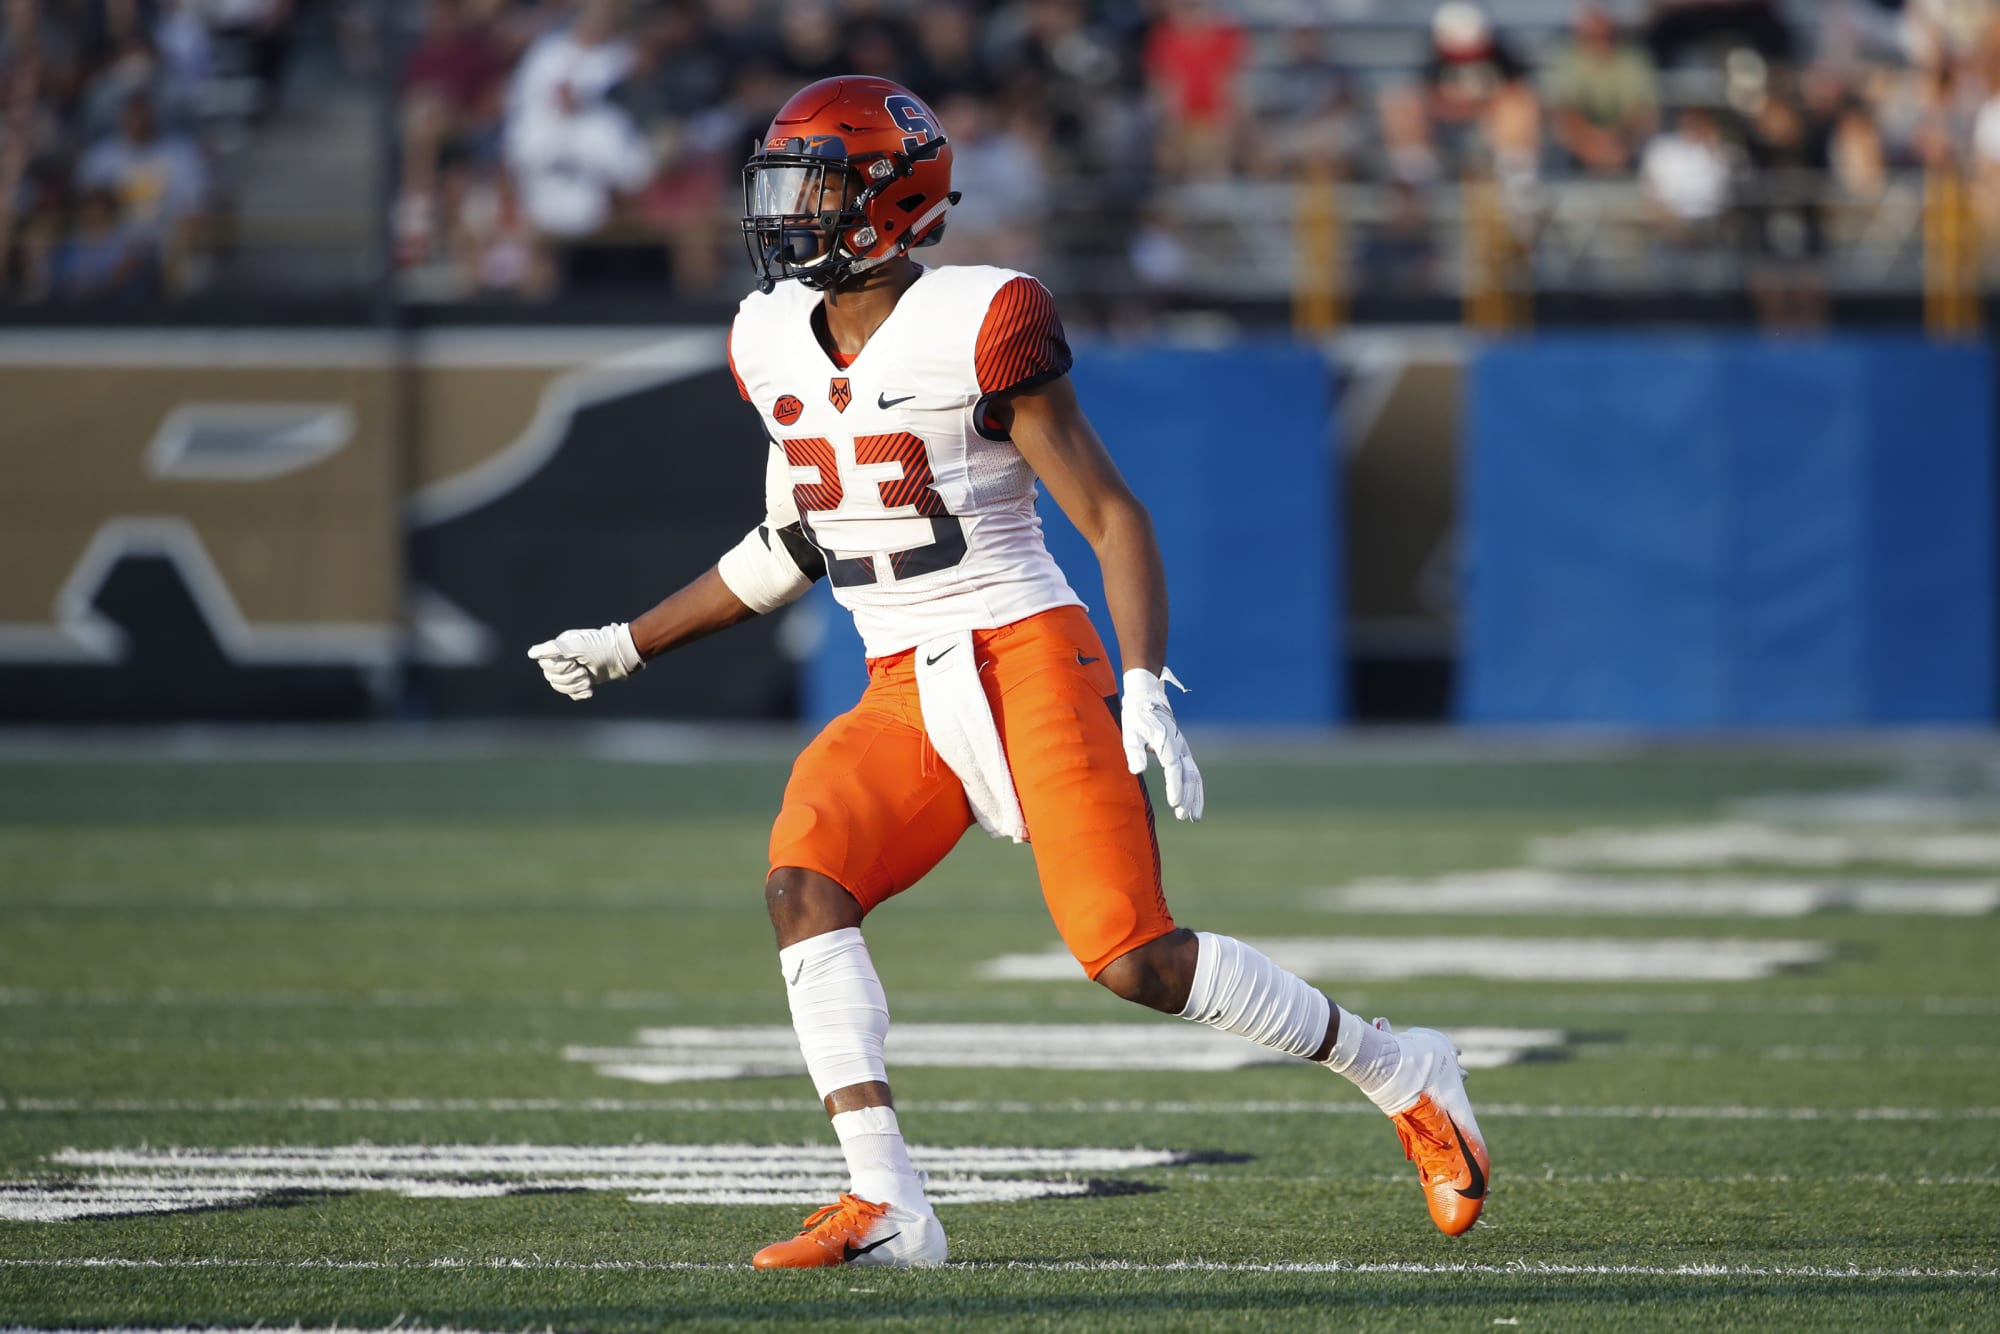 49ers NFL Draft: Ifeatu Melifonwu would be a steal in Round 3